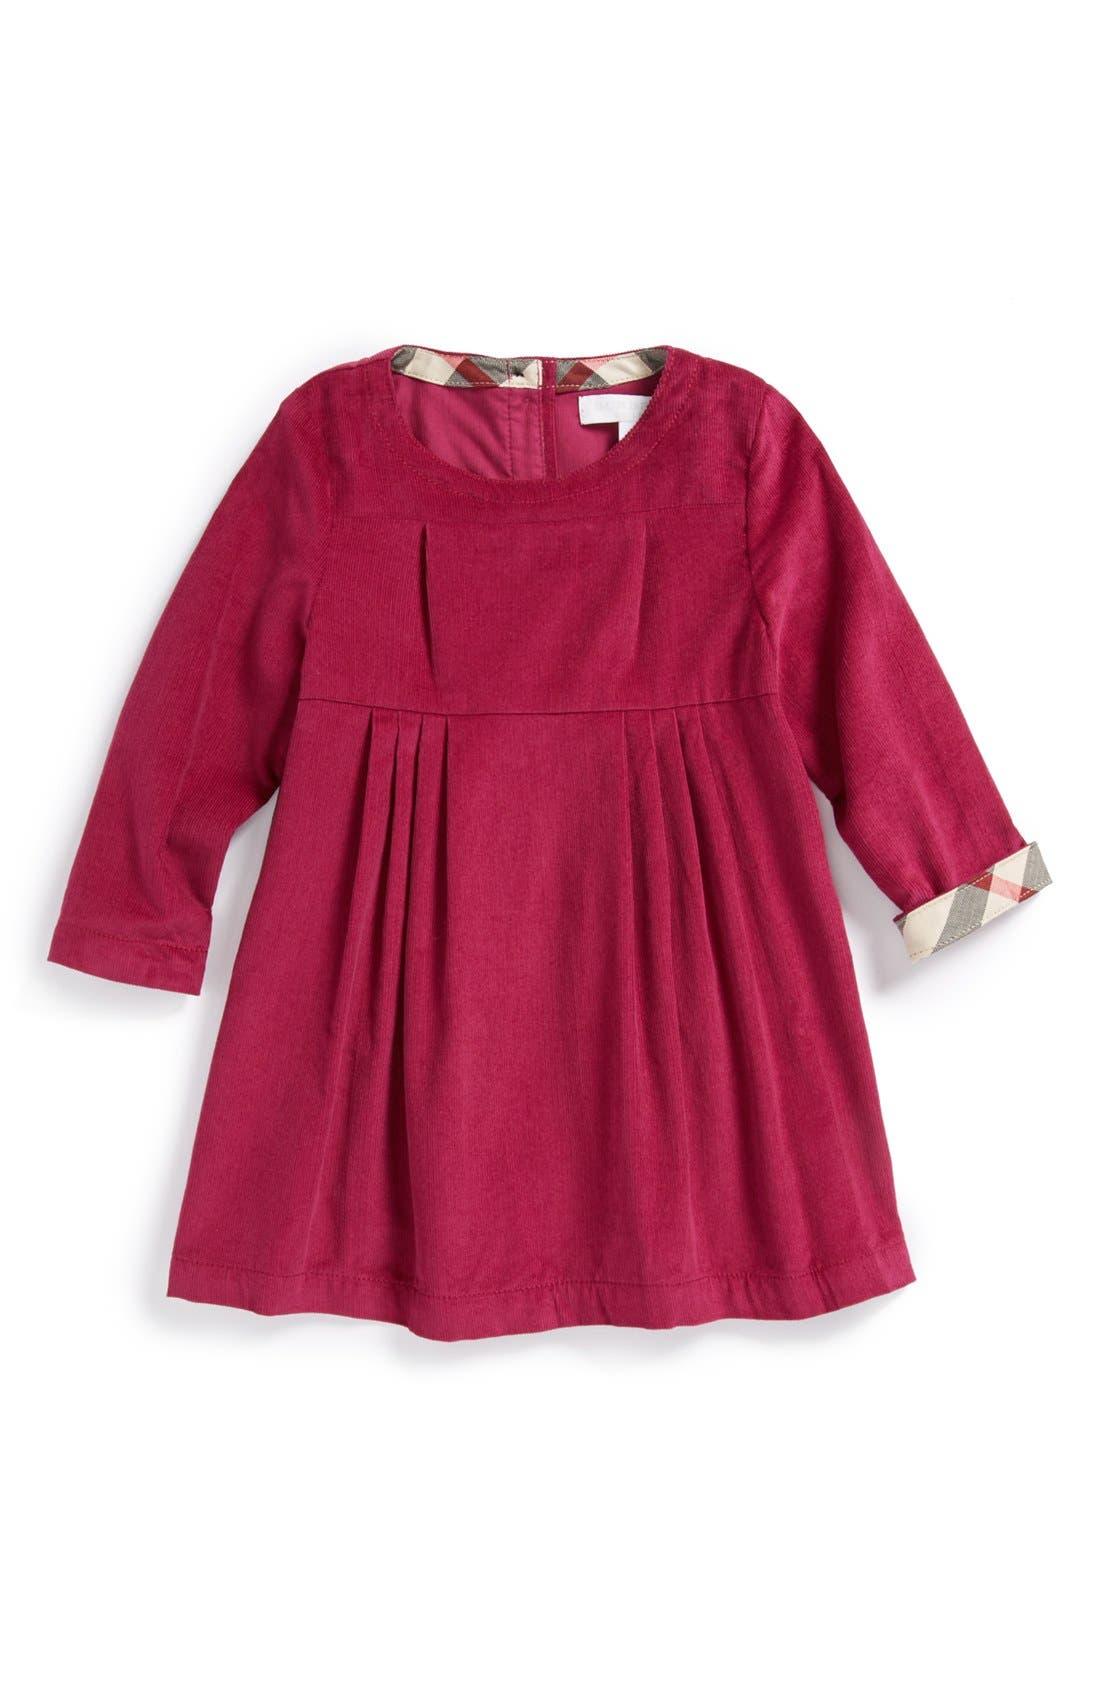 Main Image - Burberry 'Rebecca' Corduroy Dress (Baby Girls)